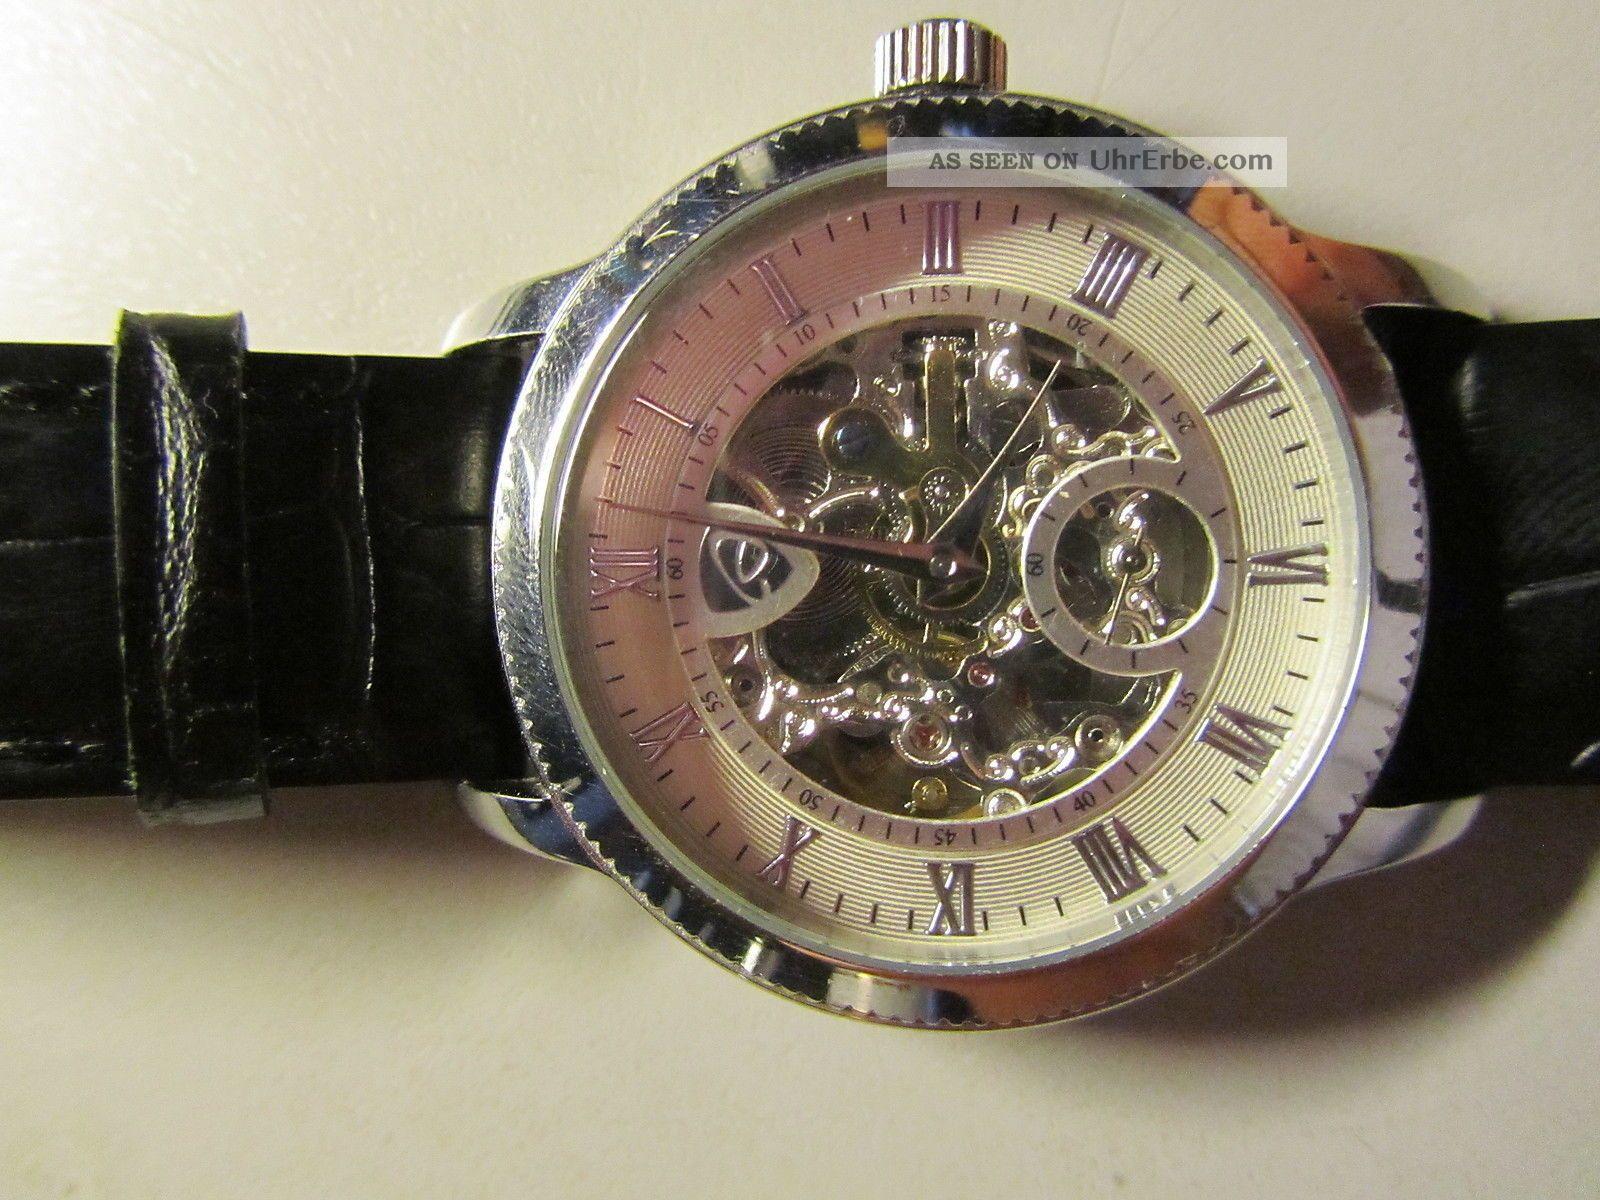 auriol automatik armbanduhr in geschenkbox herren uhr. Black Bedroom Furniture Sets. Home Design Ideas